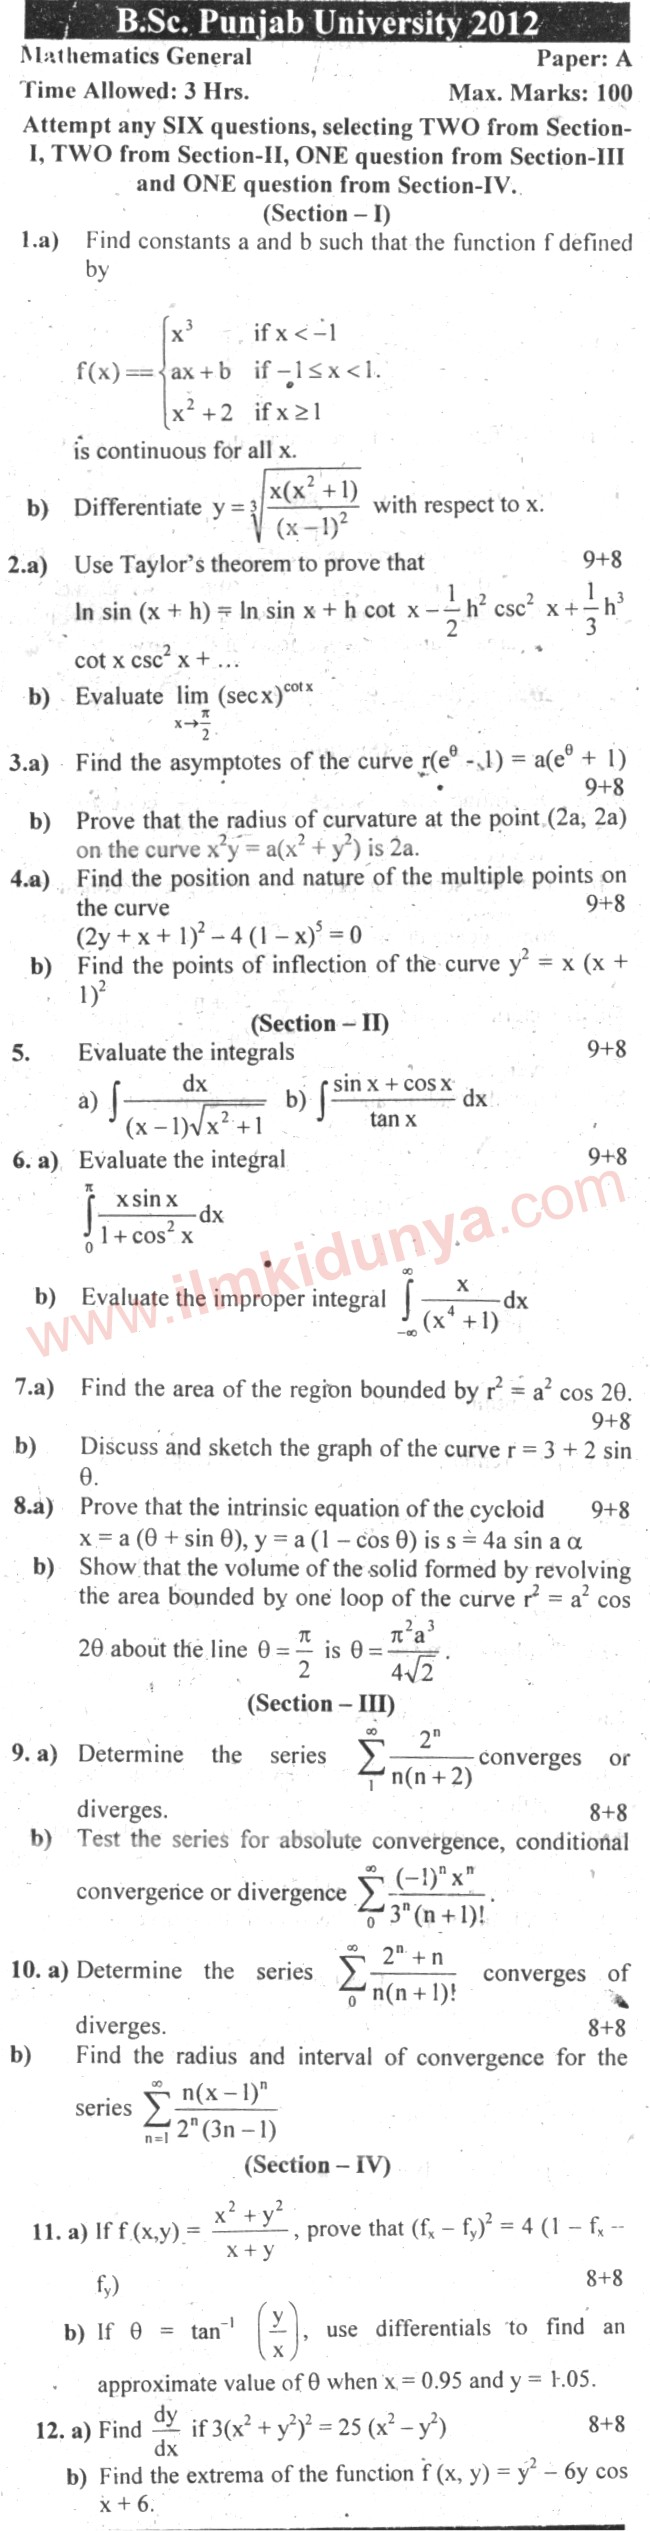 Past Papers 2012 Punjab University BSc Mathematics General Paper A